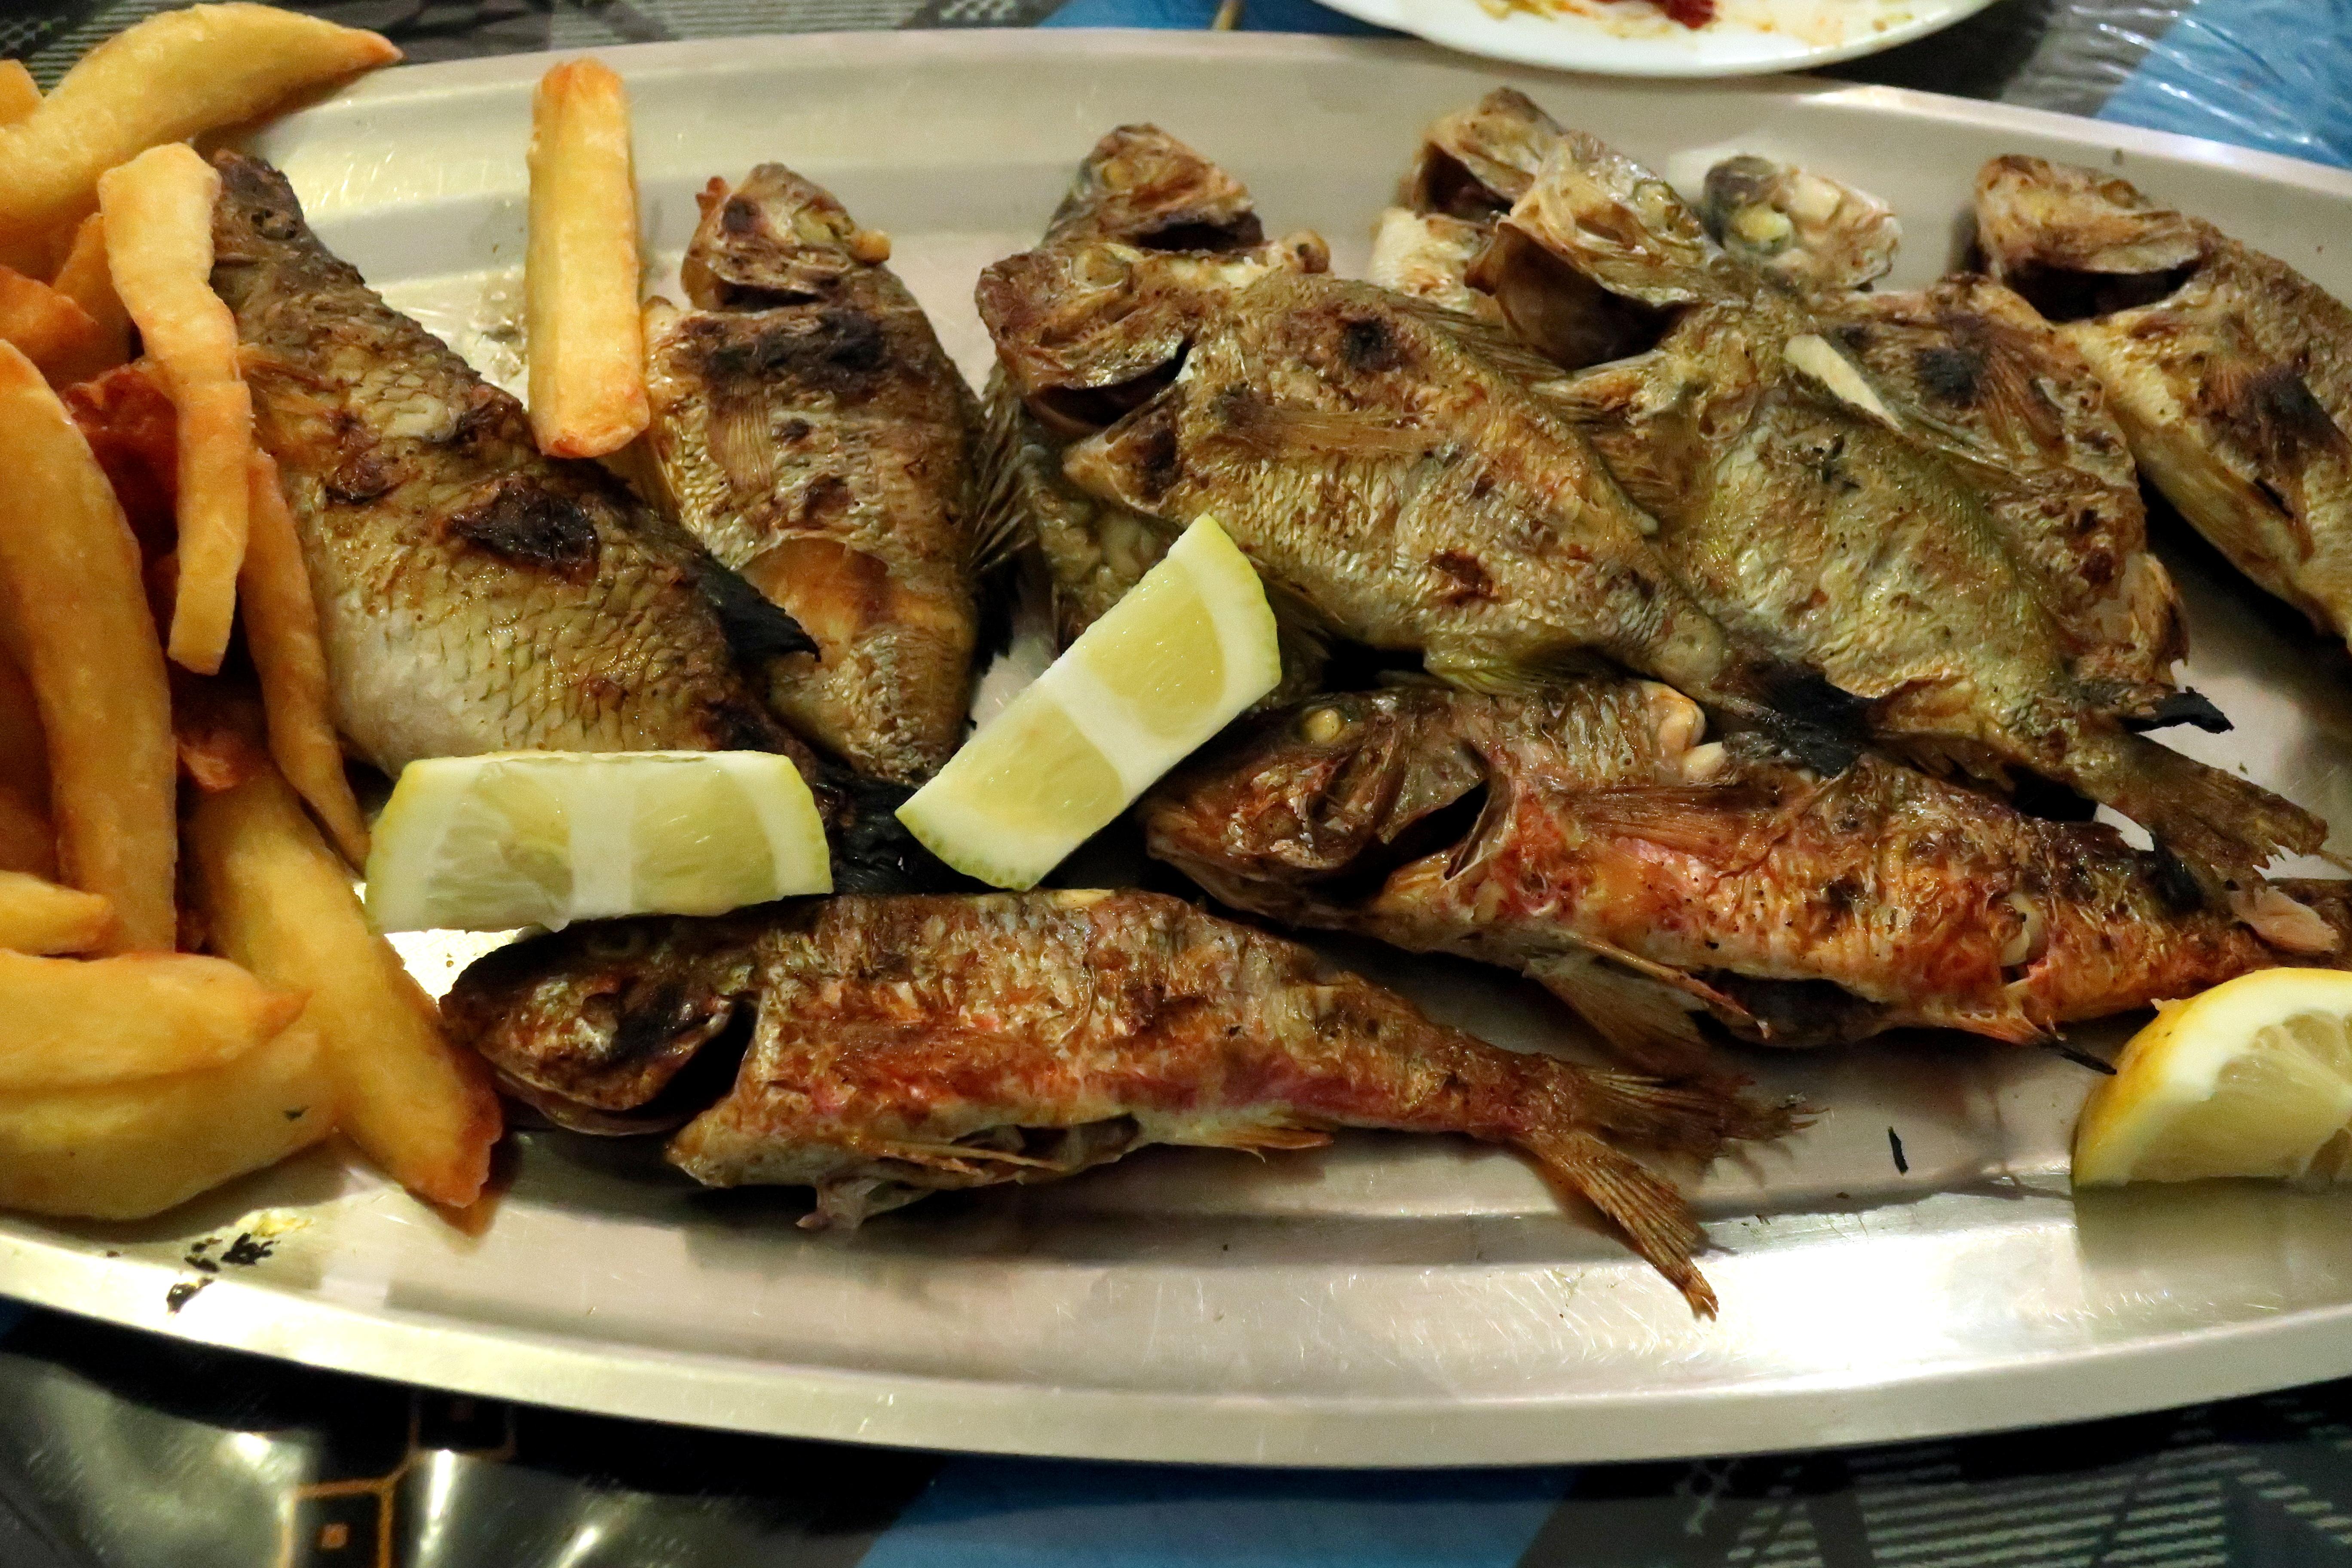 Gambar Ikan Goreng Shishamo Ikan Bakar Makanan Laut Pescado